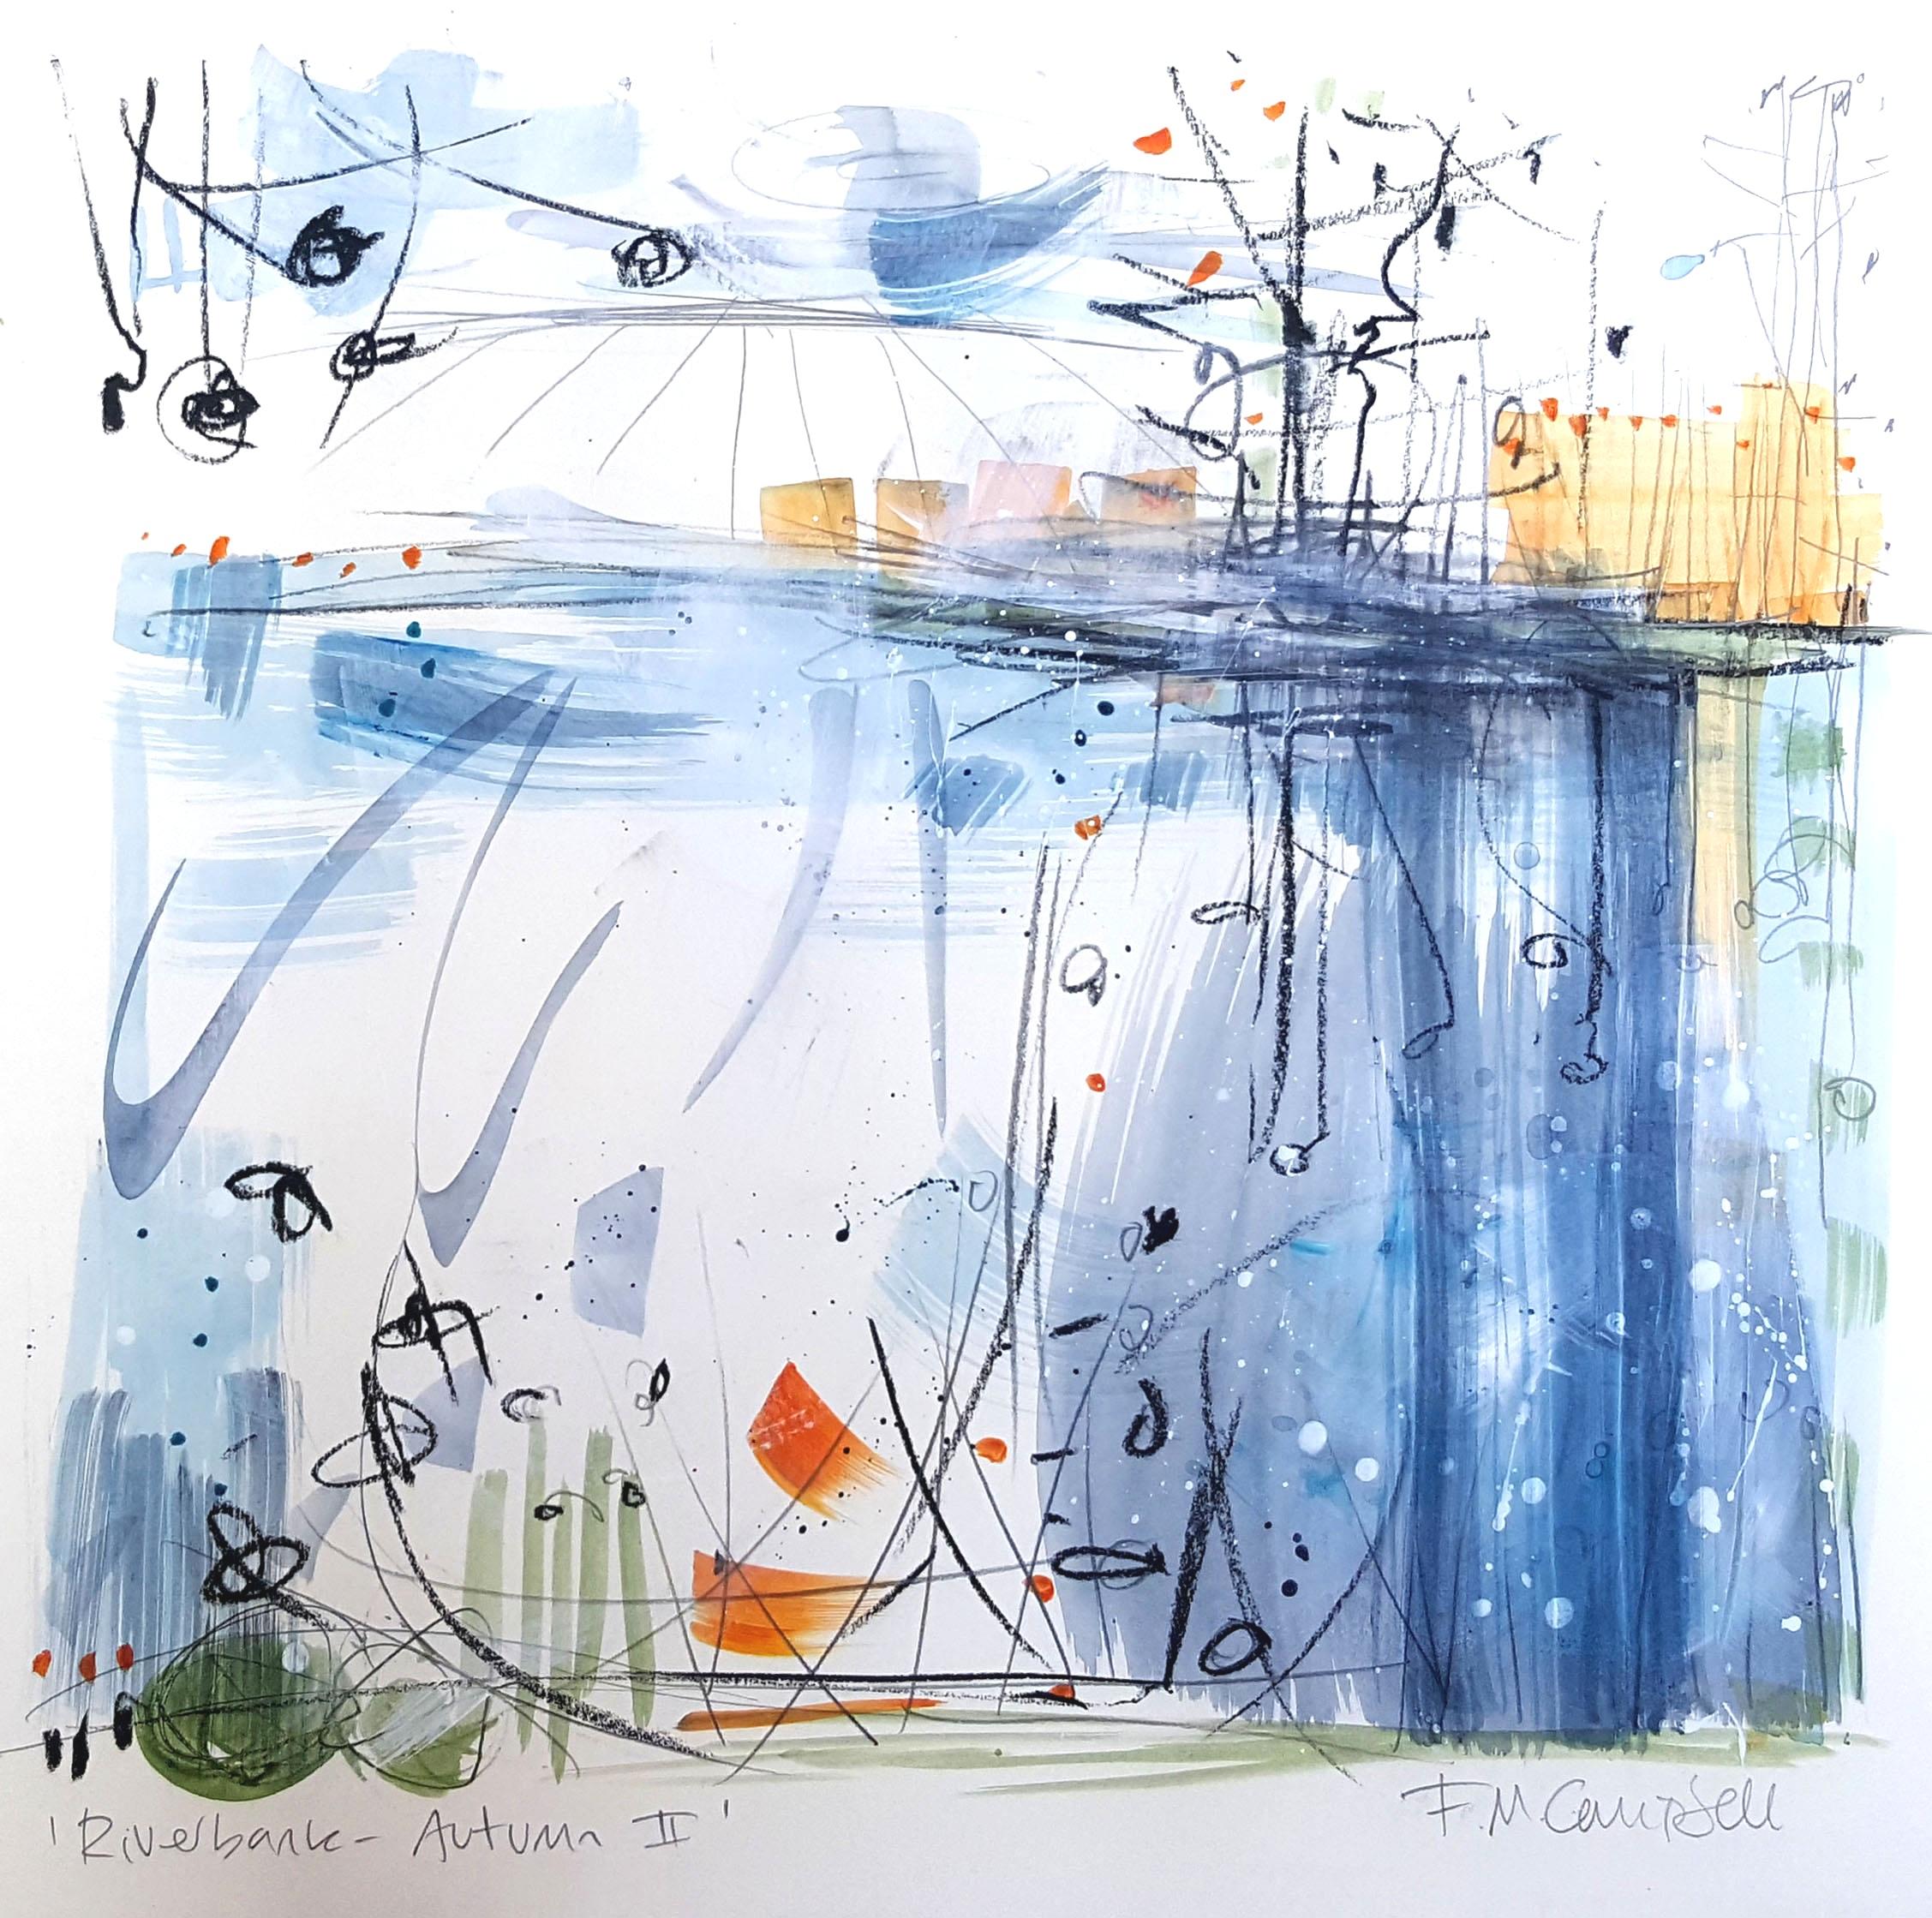 'Riverbank - Autumn II'